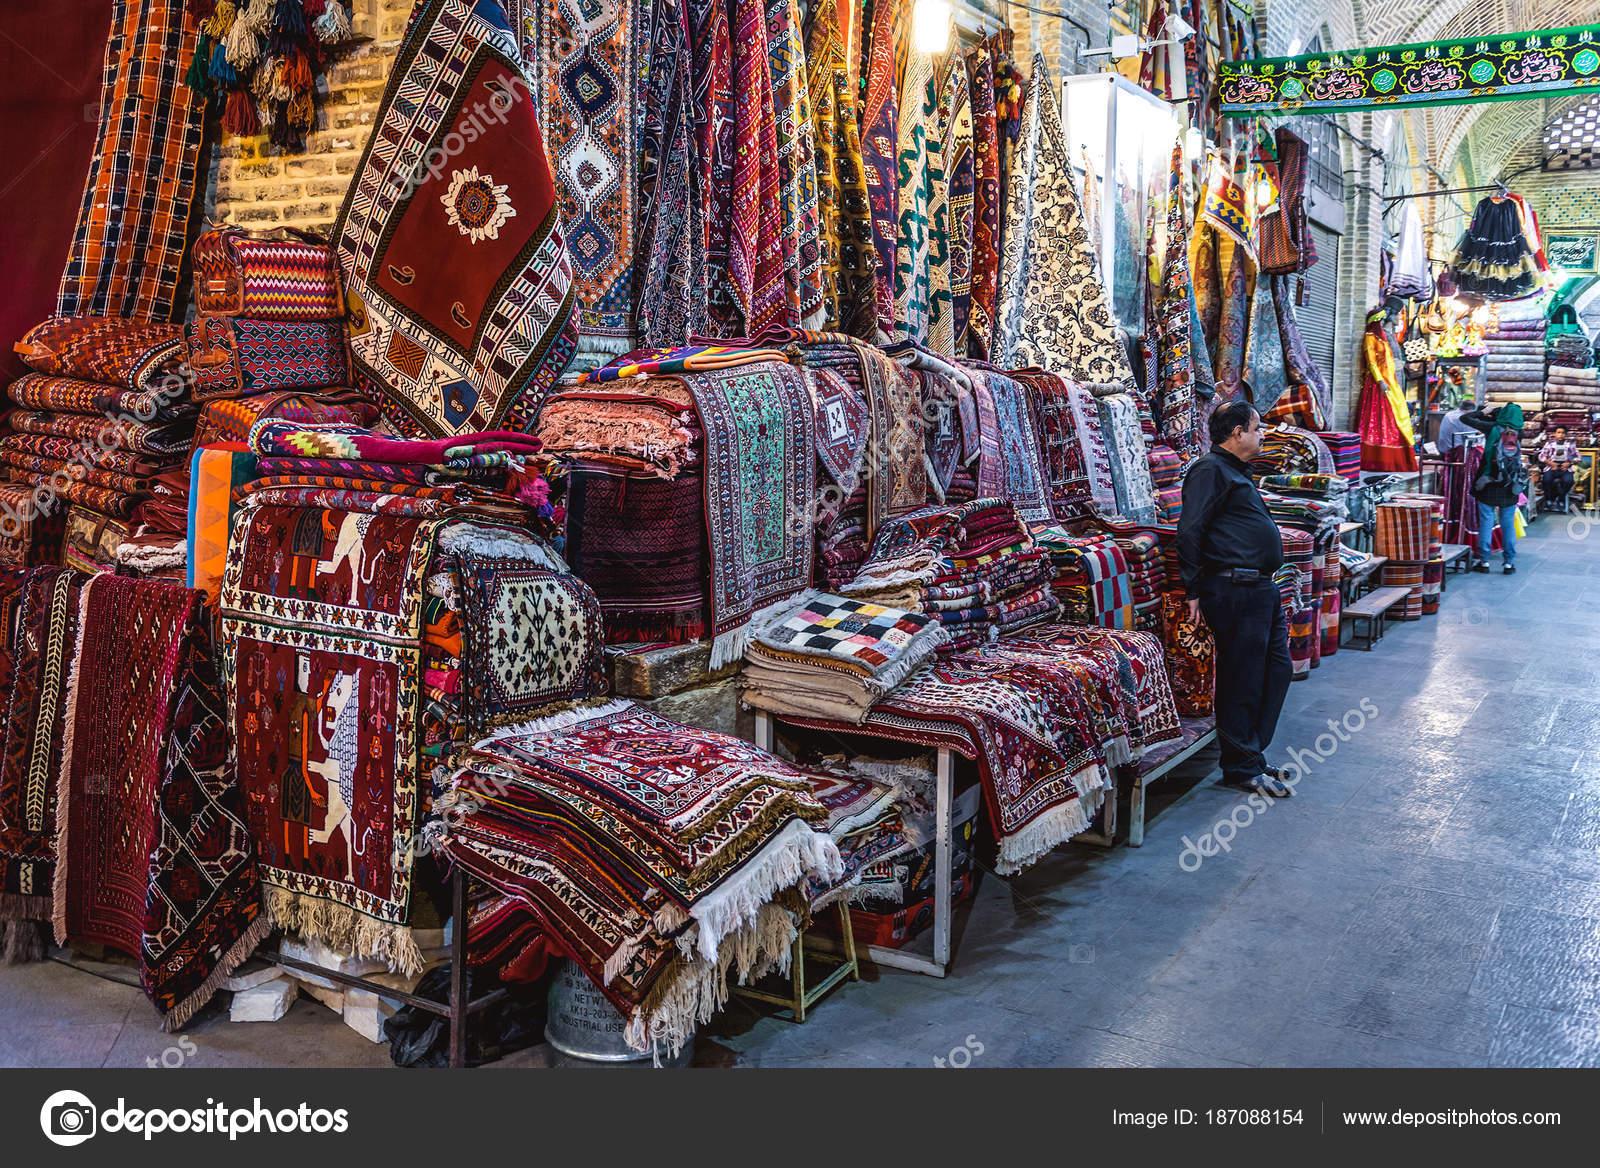 Bazaar in Shiraz – Stock Editorial Photo © fotokon #187088154